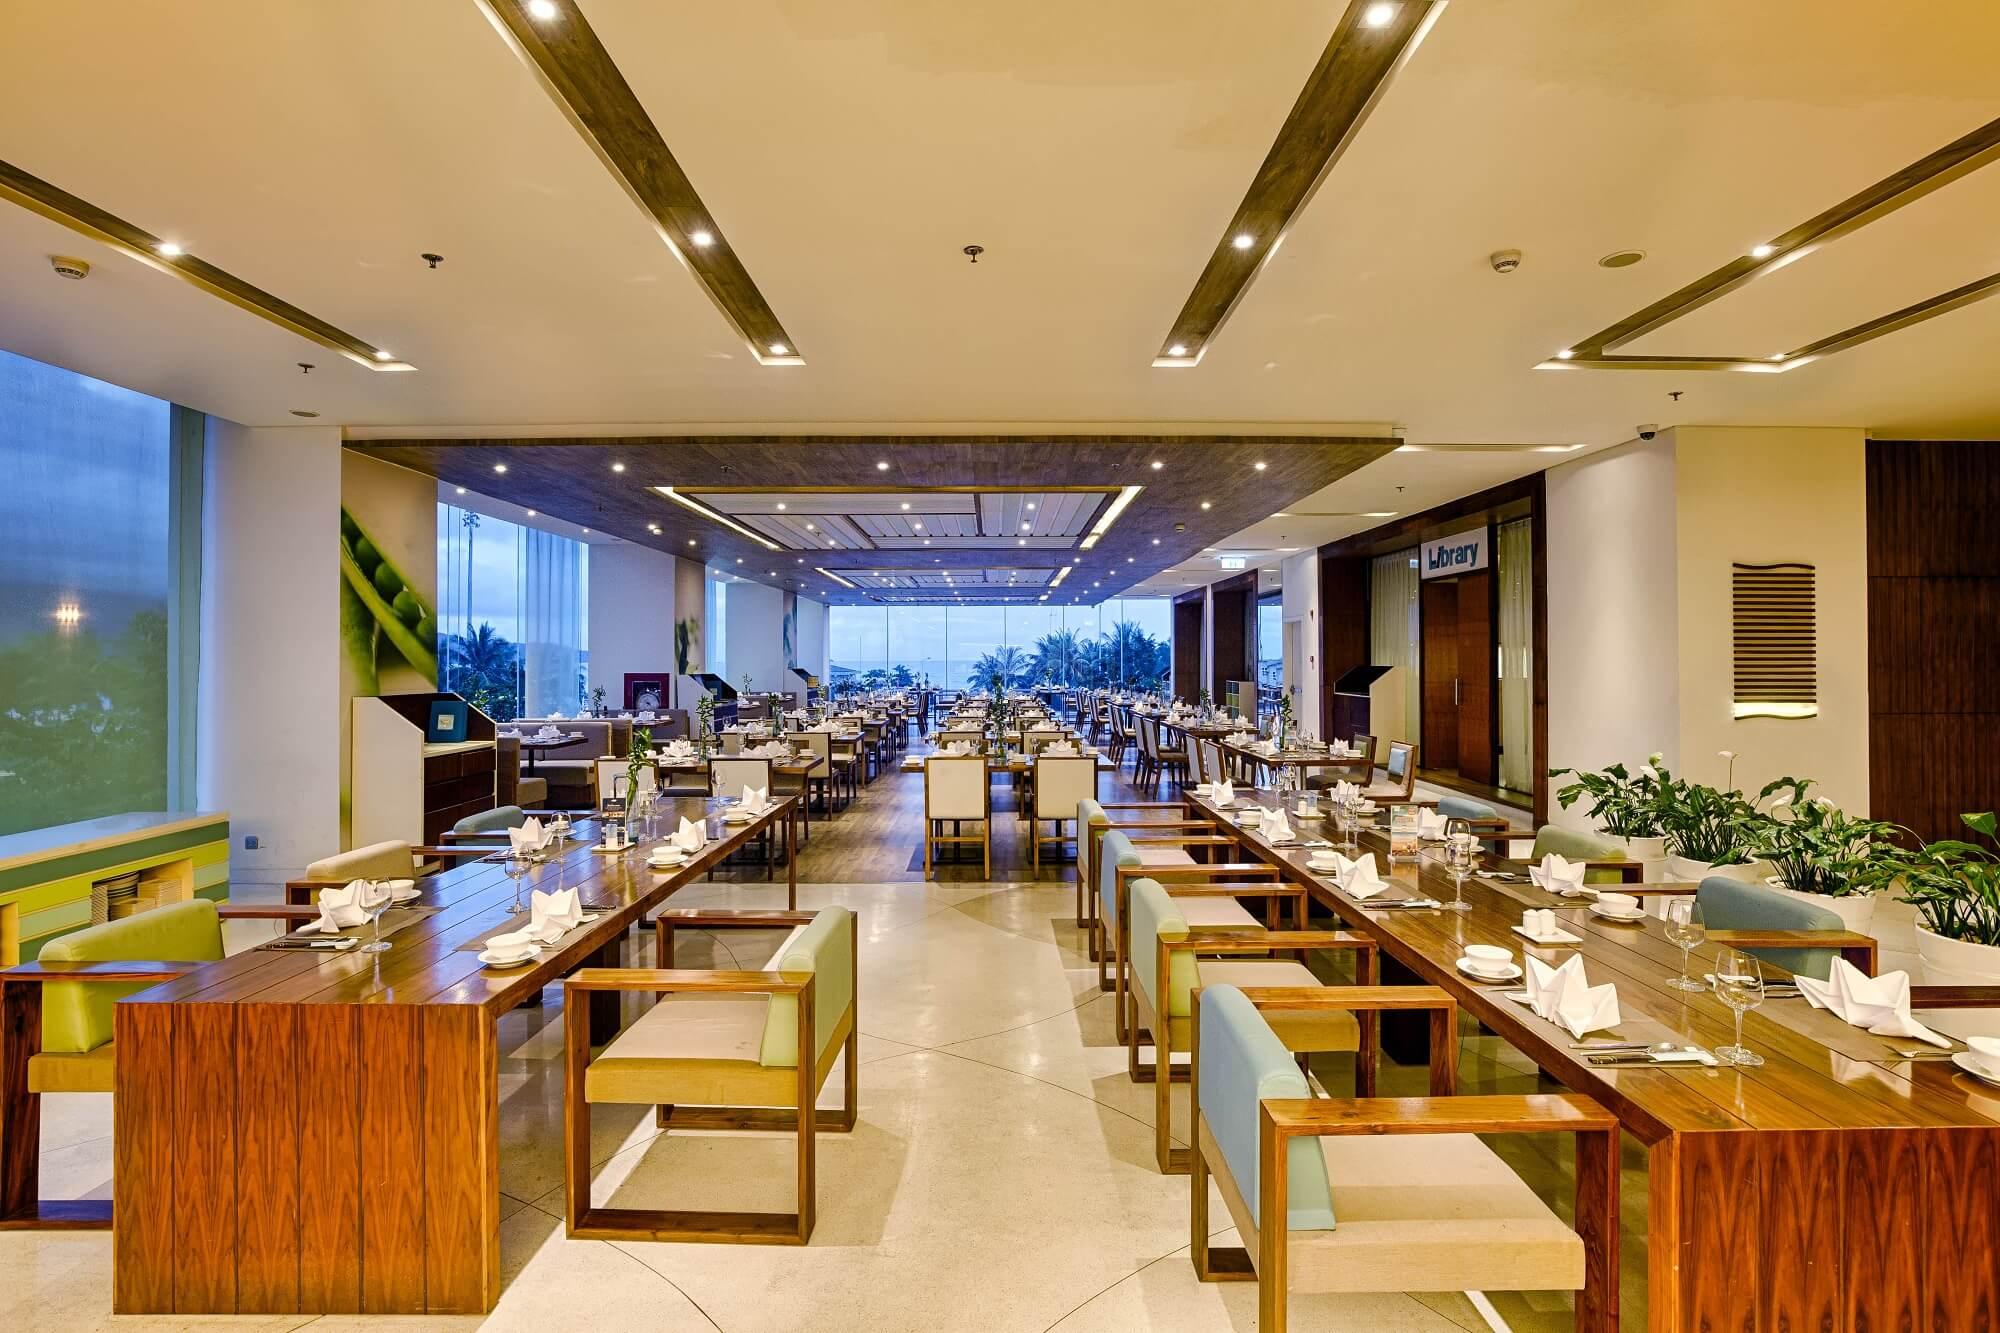 Fisca Restaurant A La Carte Danang Beach Hotel 200 Vo Nguyen Giap Danang Fantasticity Com 01